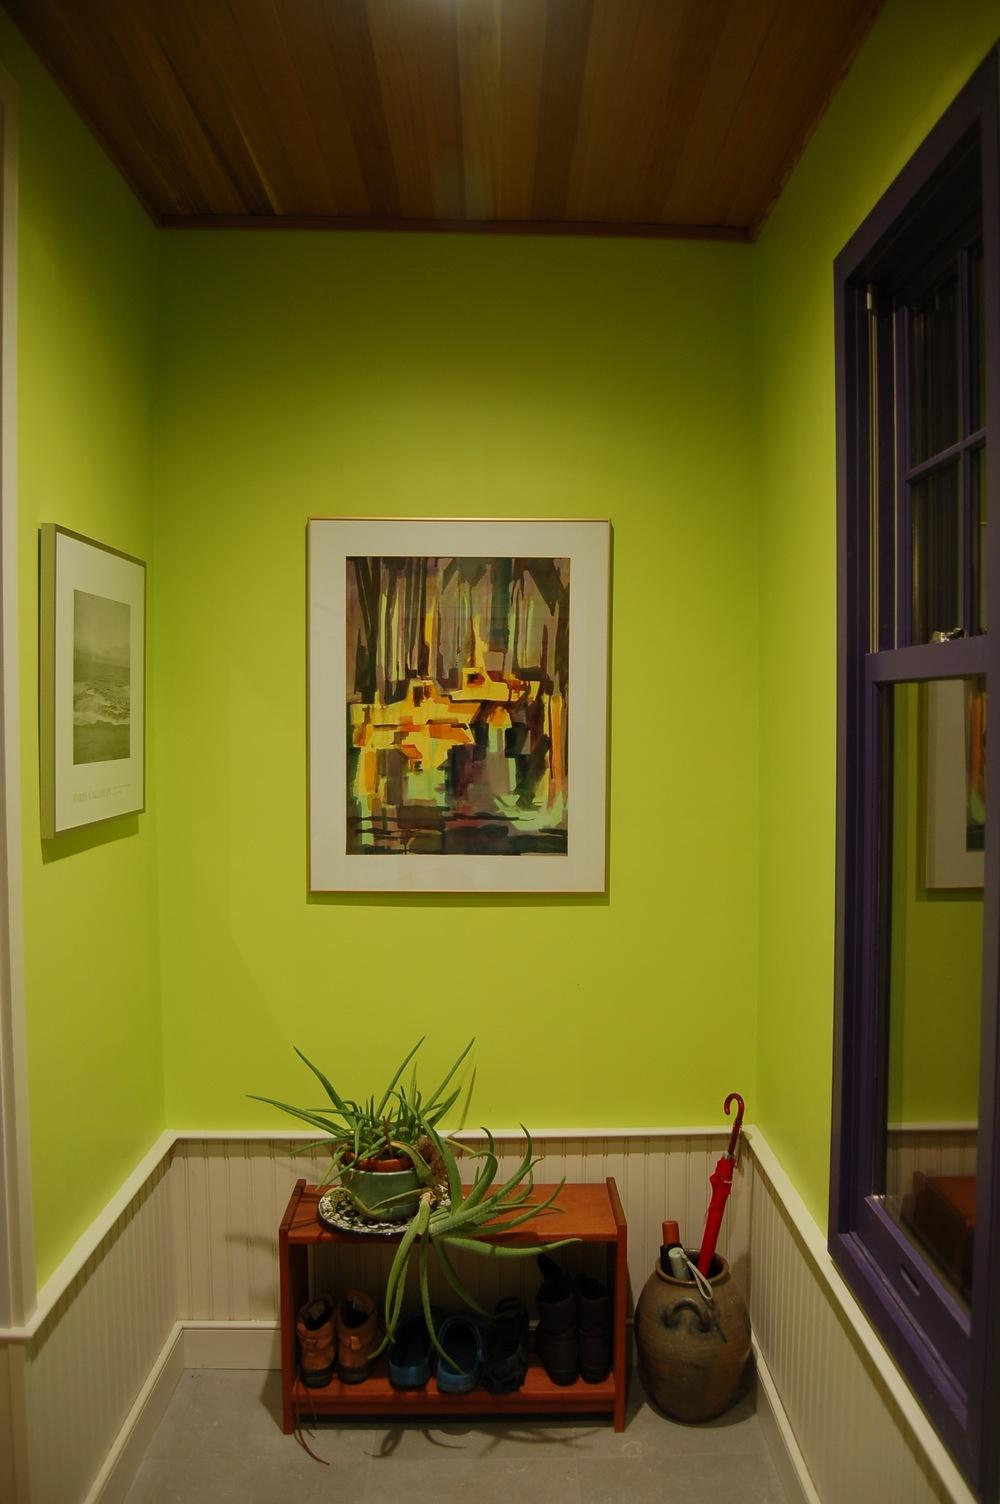 Brixham_mud room.JPG